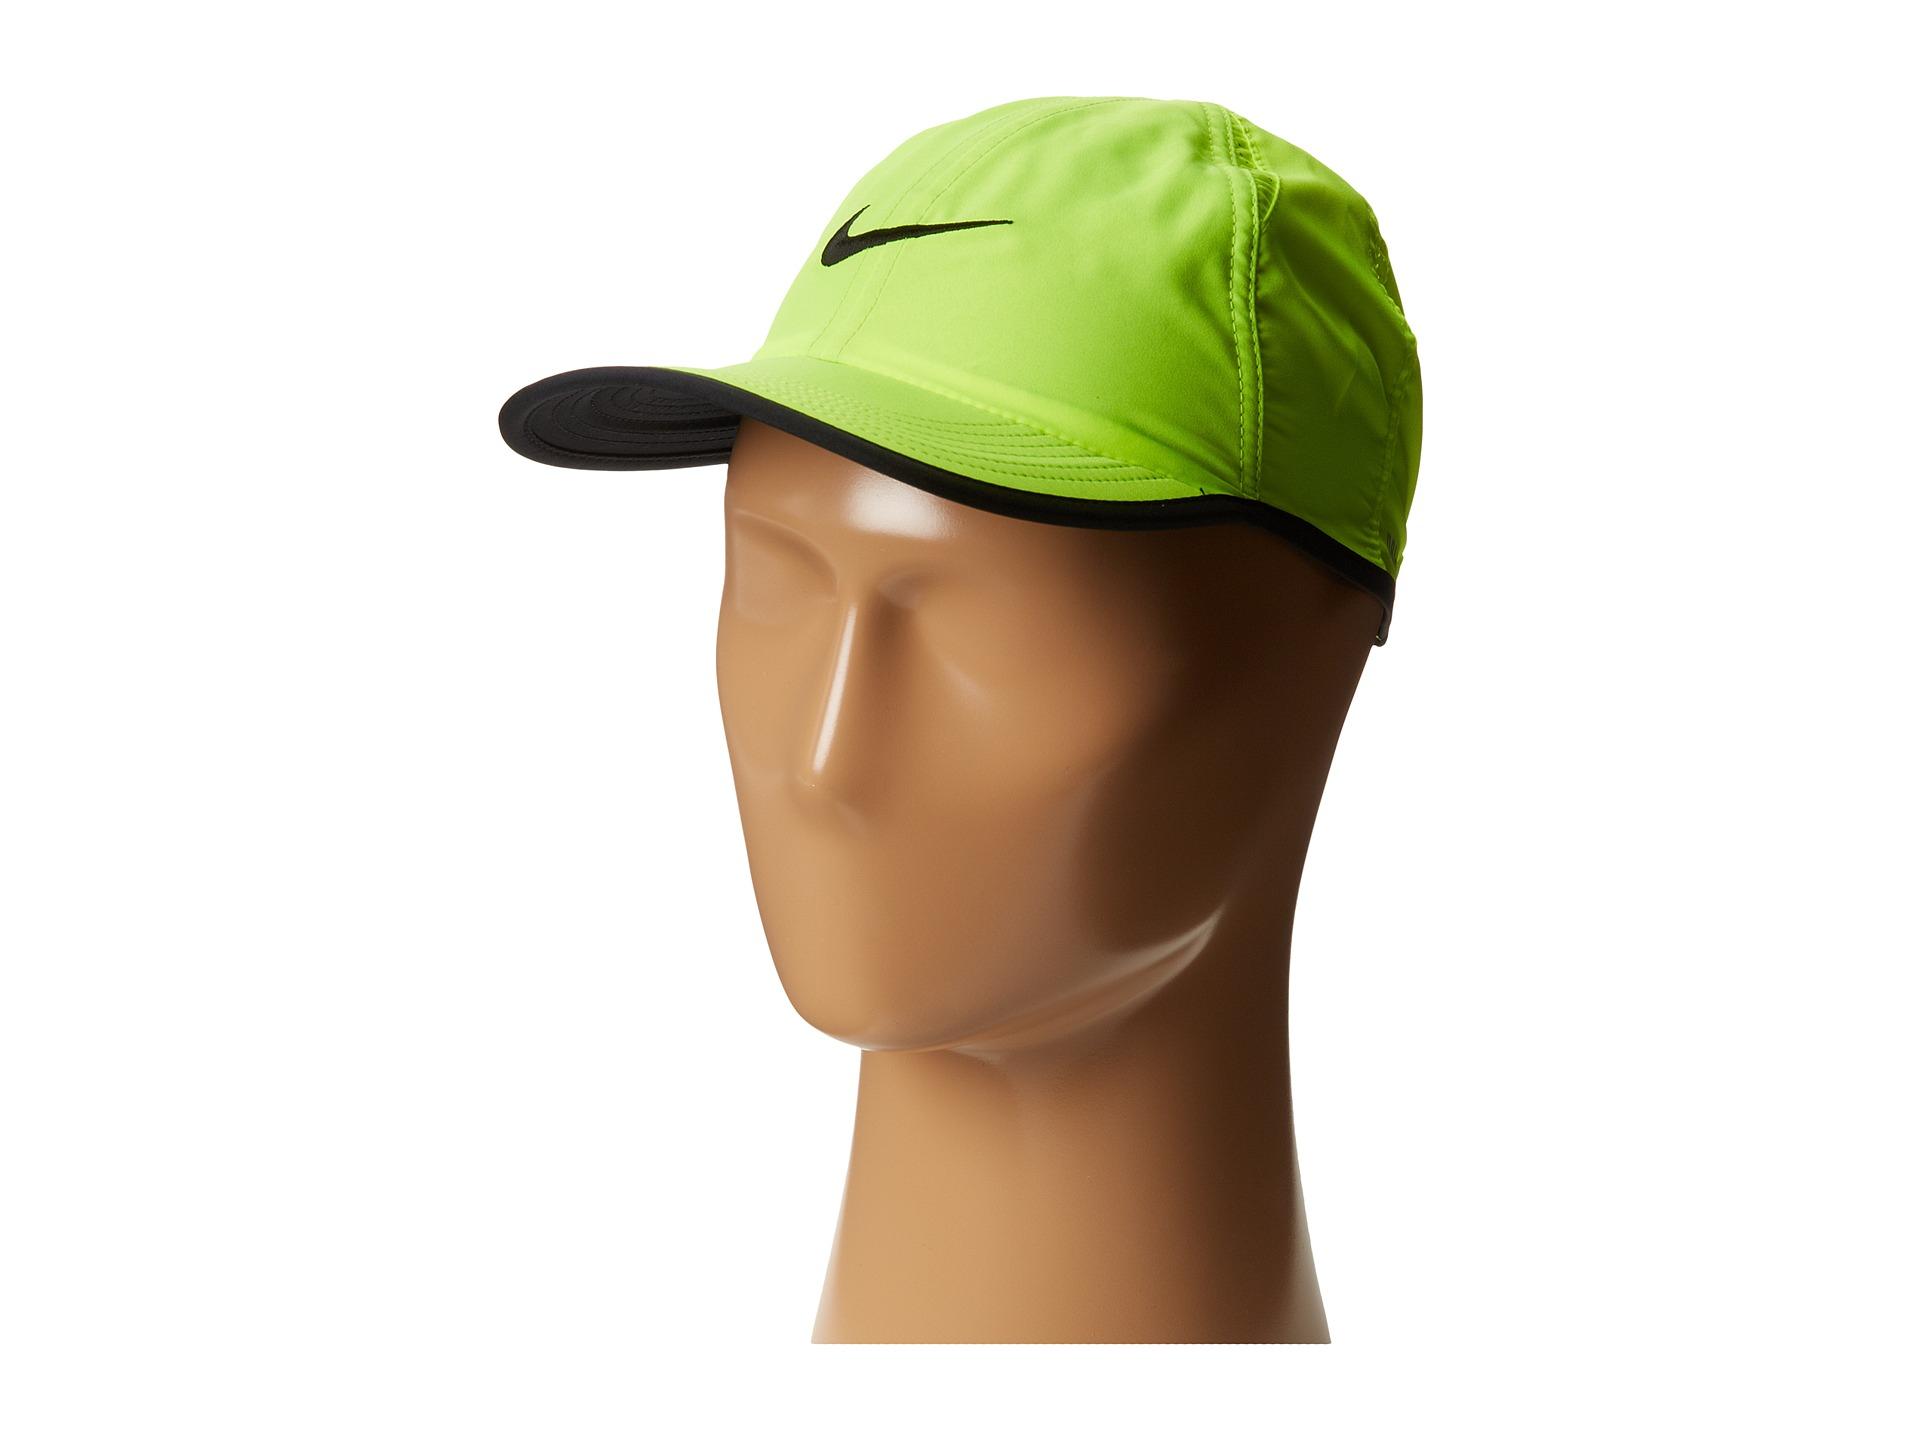 87070f2bc45 Lyst - Nike Featherlight Adj Cap Youth in Black